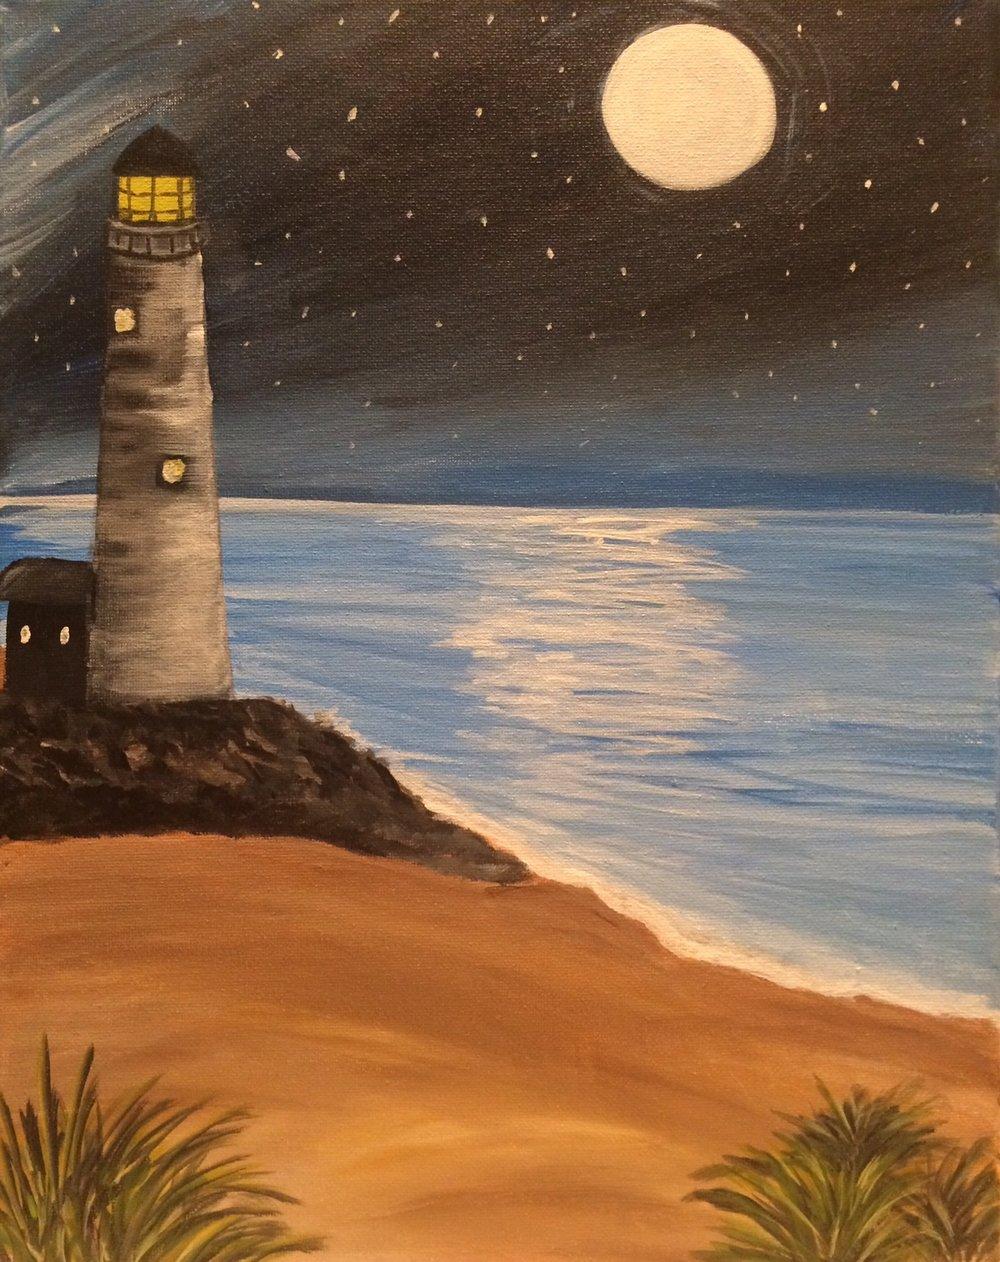 Moonlight lighthouse